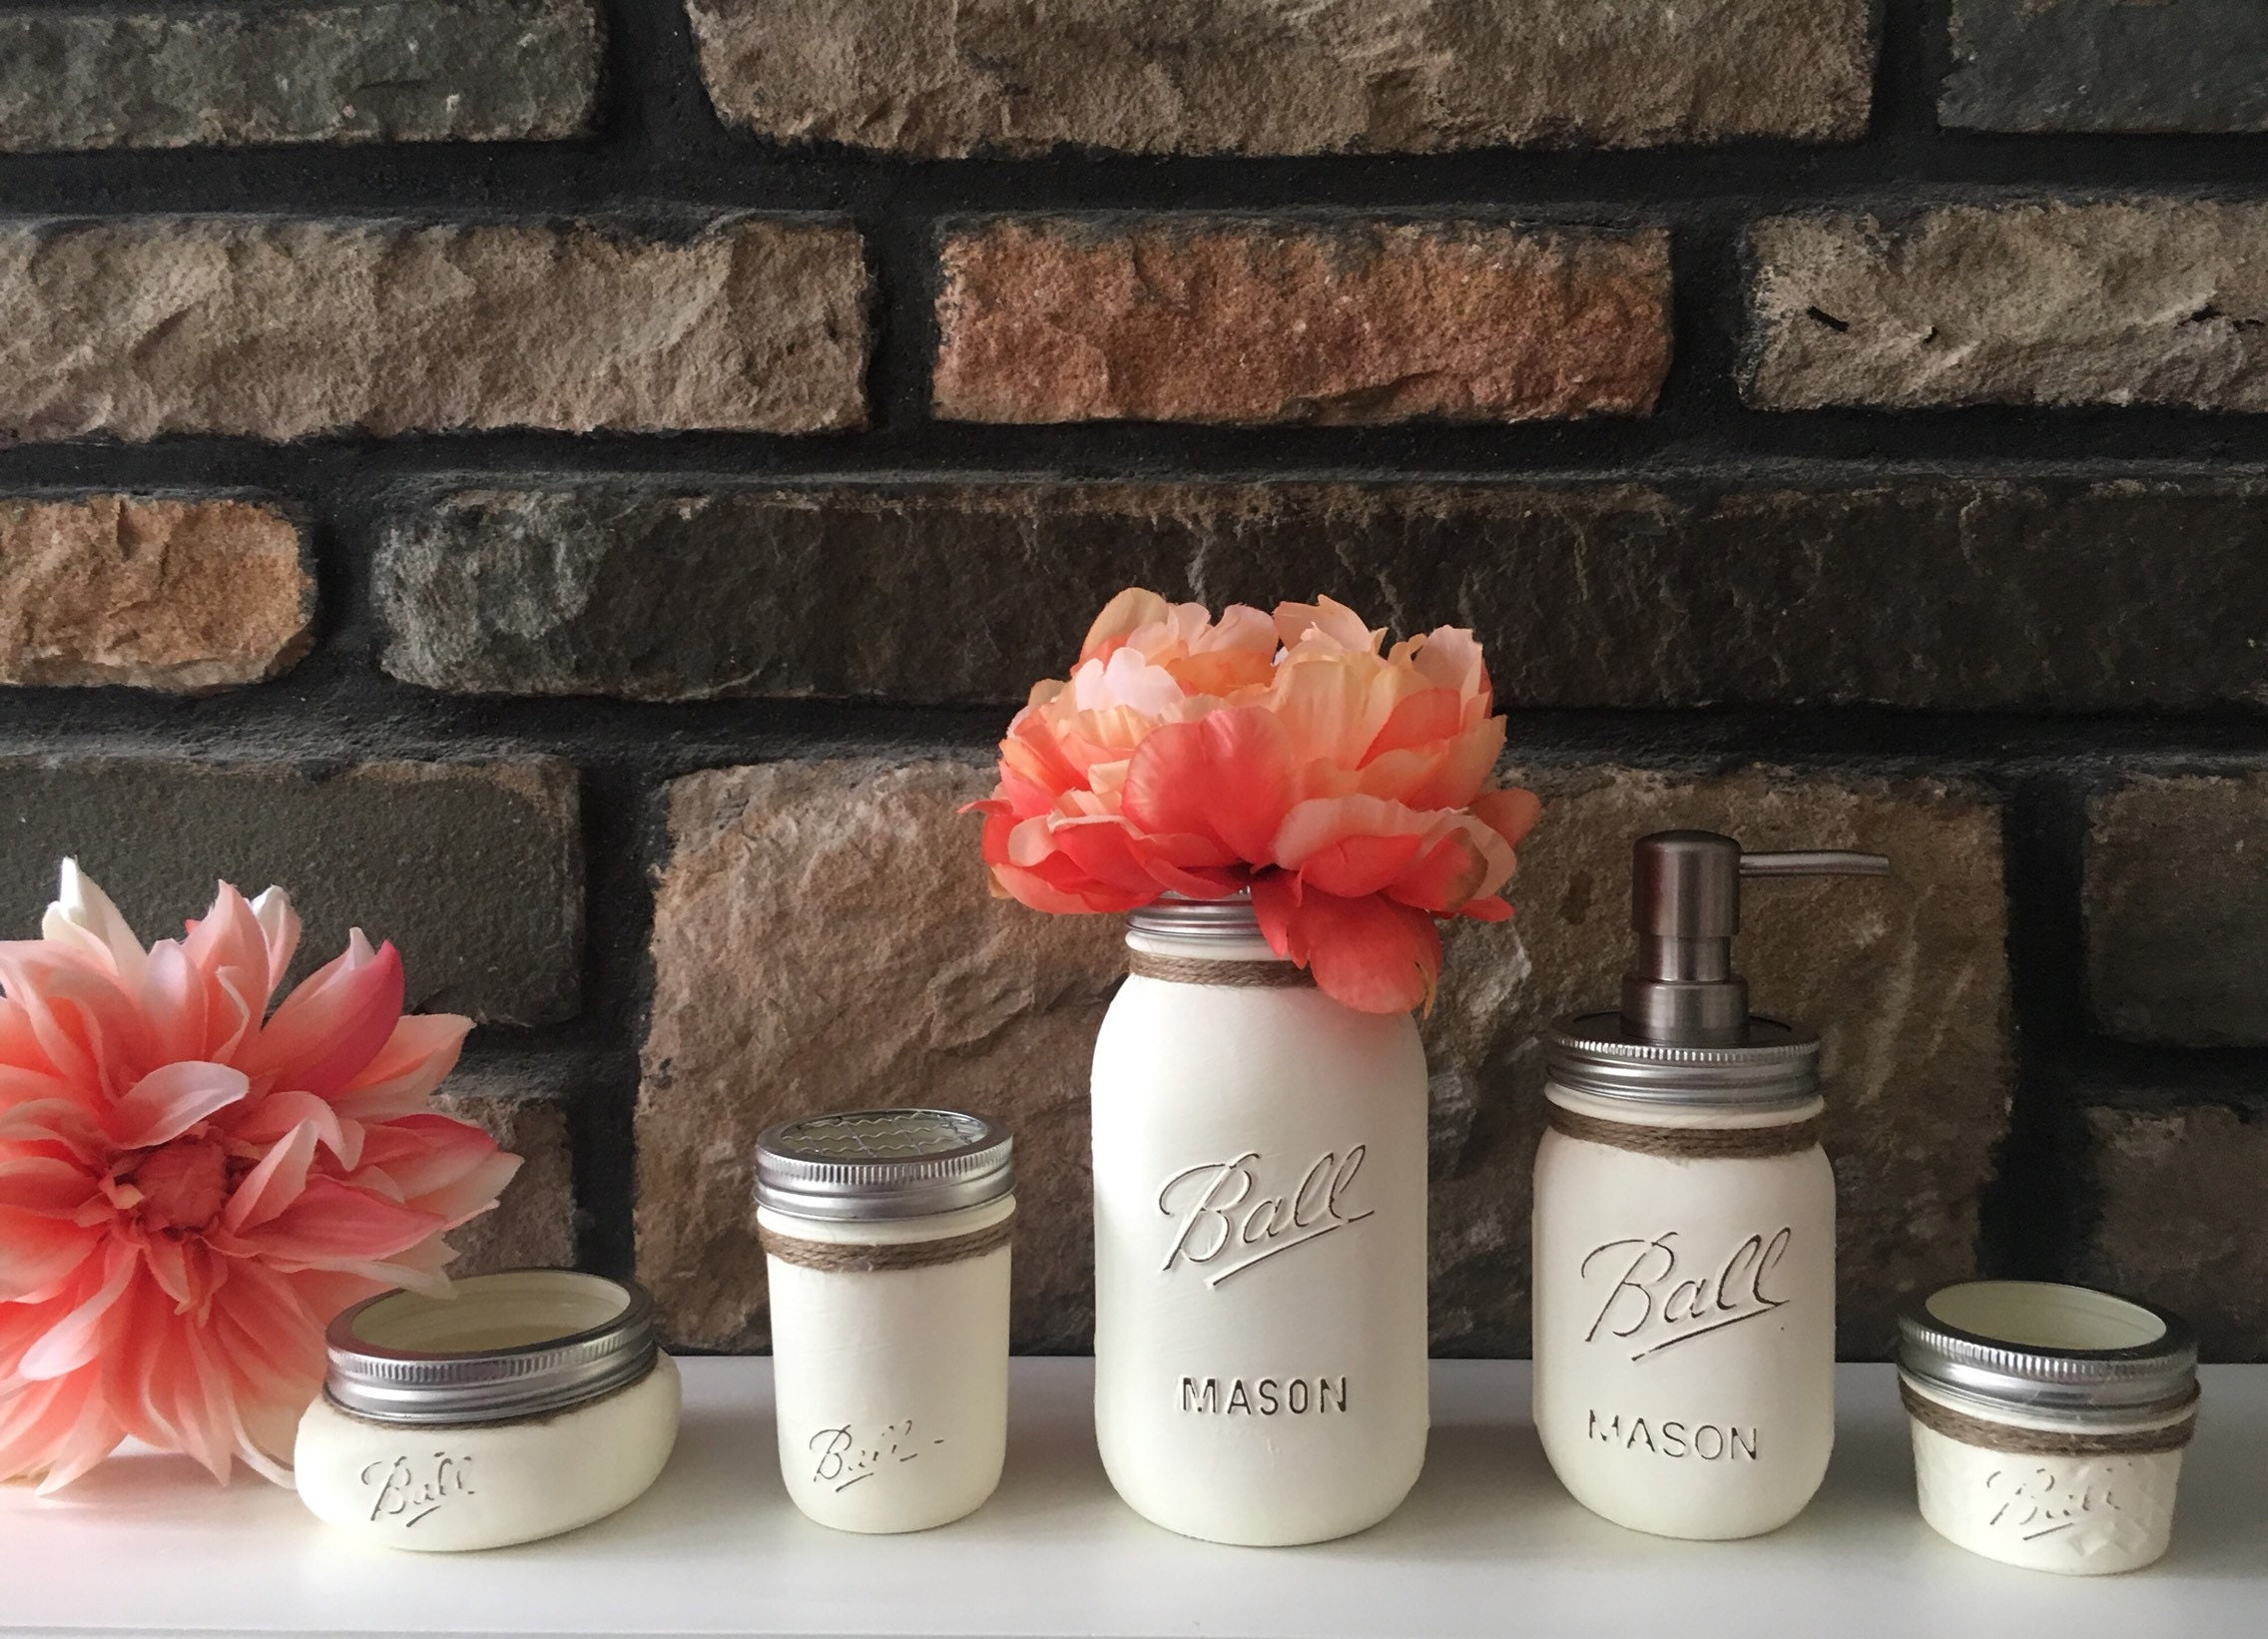 Gentil Bathroom Set Bathroom Mason Jar Set Soap Dispenser Mason | Etsy